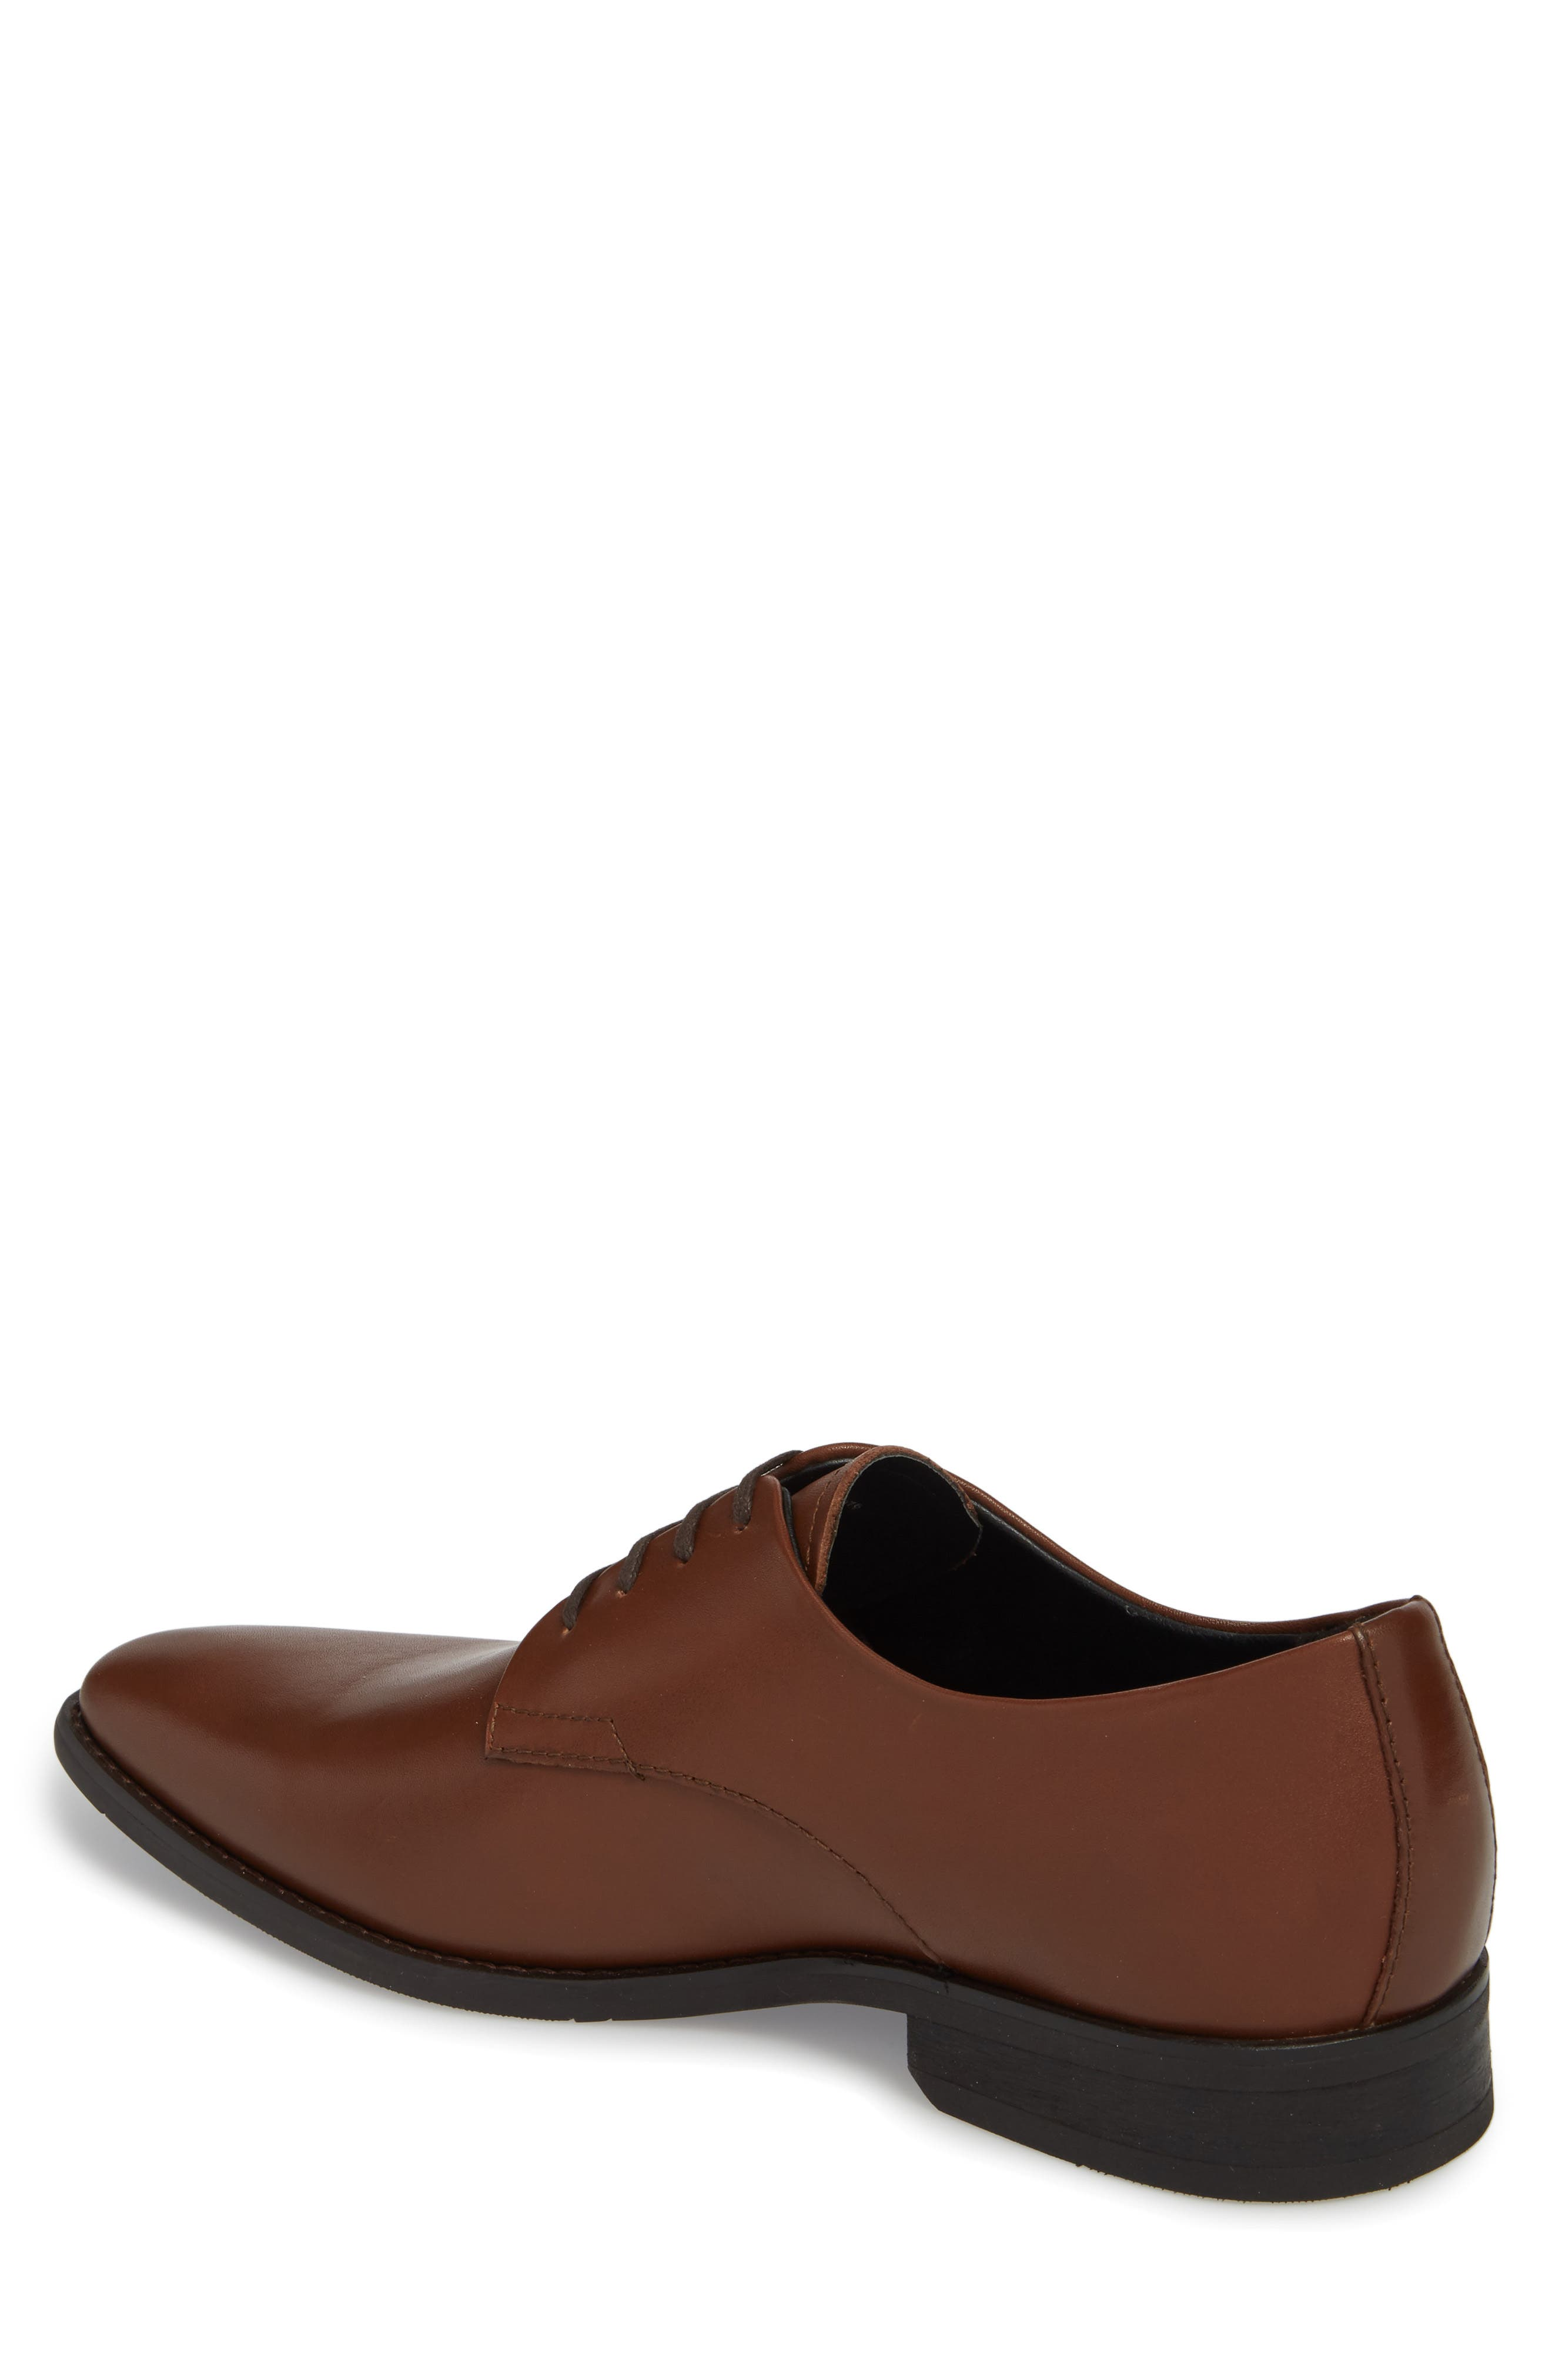 'Ramses' Plain Toe Derby,                             Alternate thumbnail 2, color,                             Tan Leather